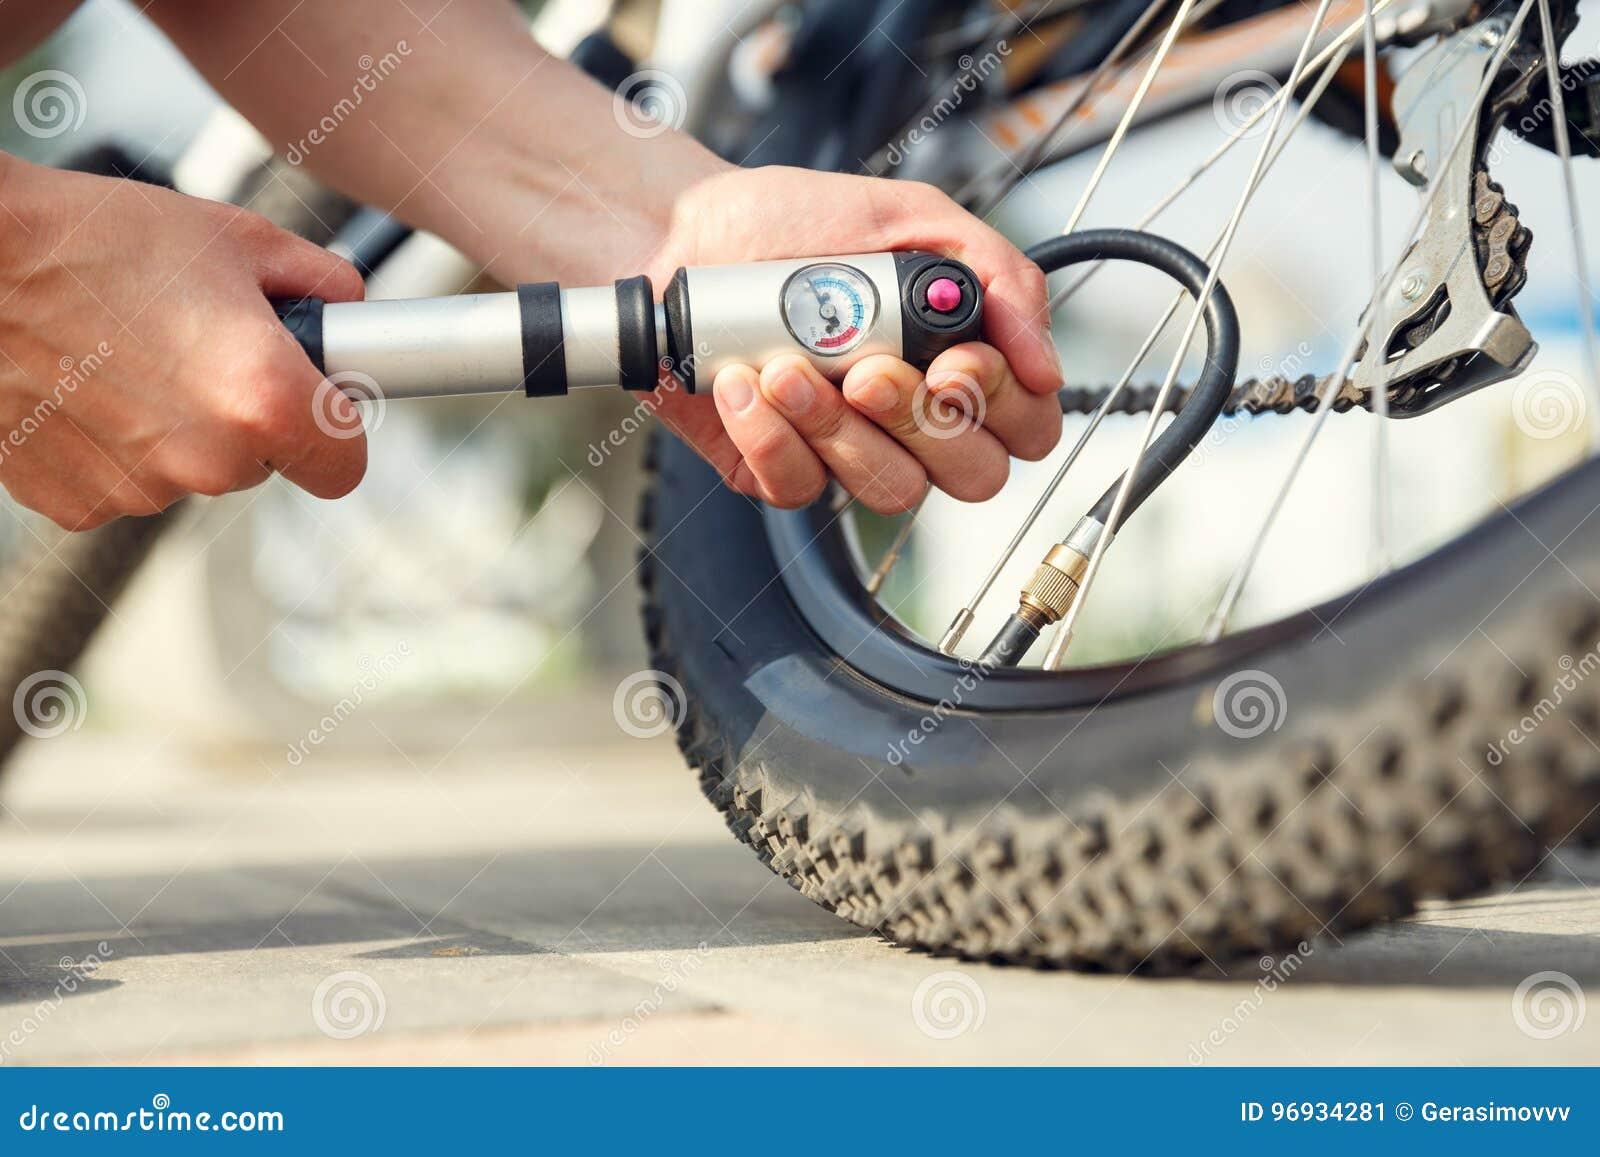 Pumping a bike tire